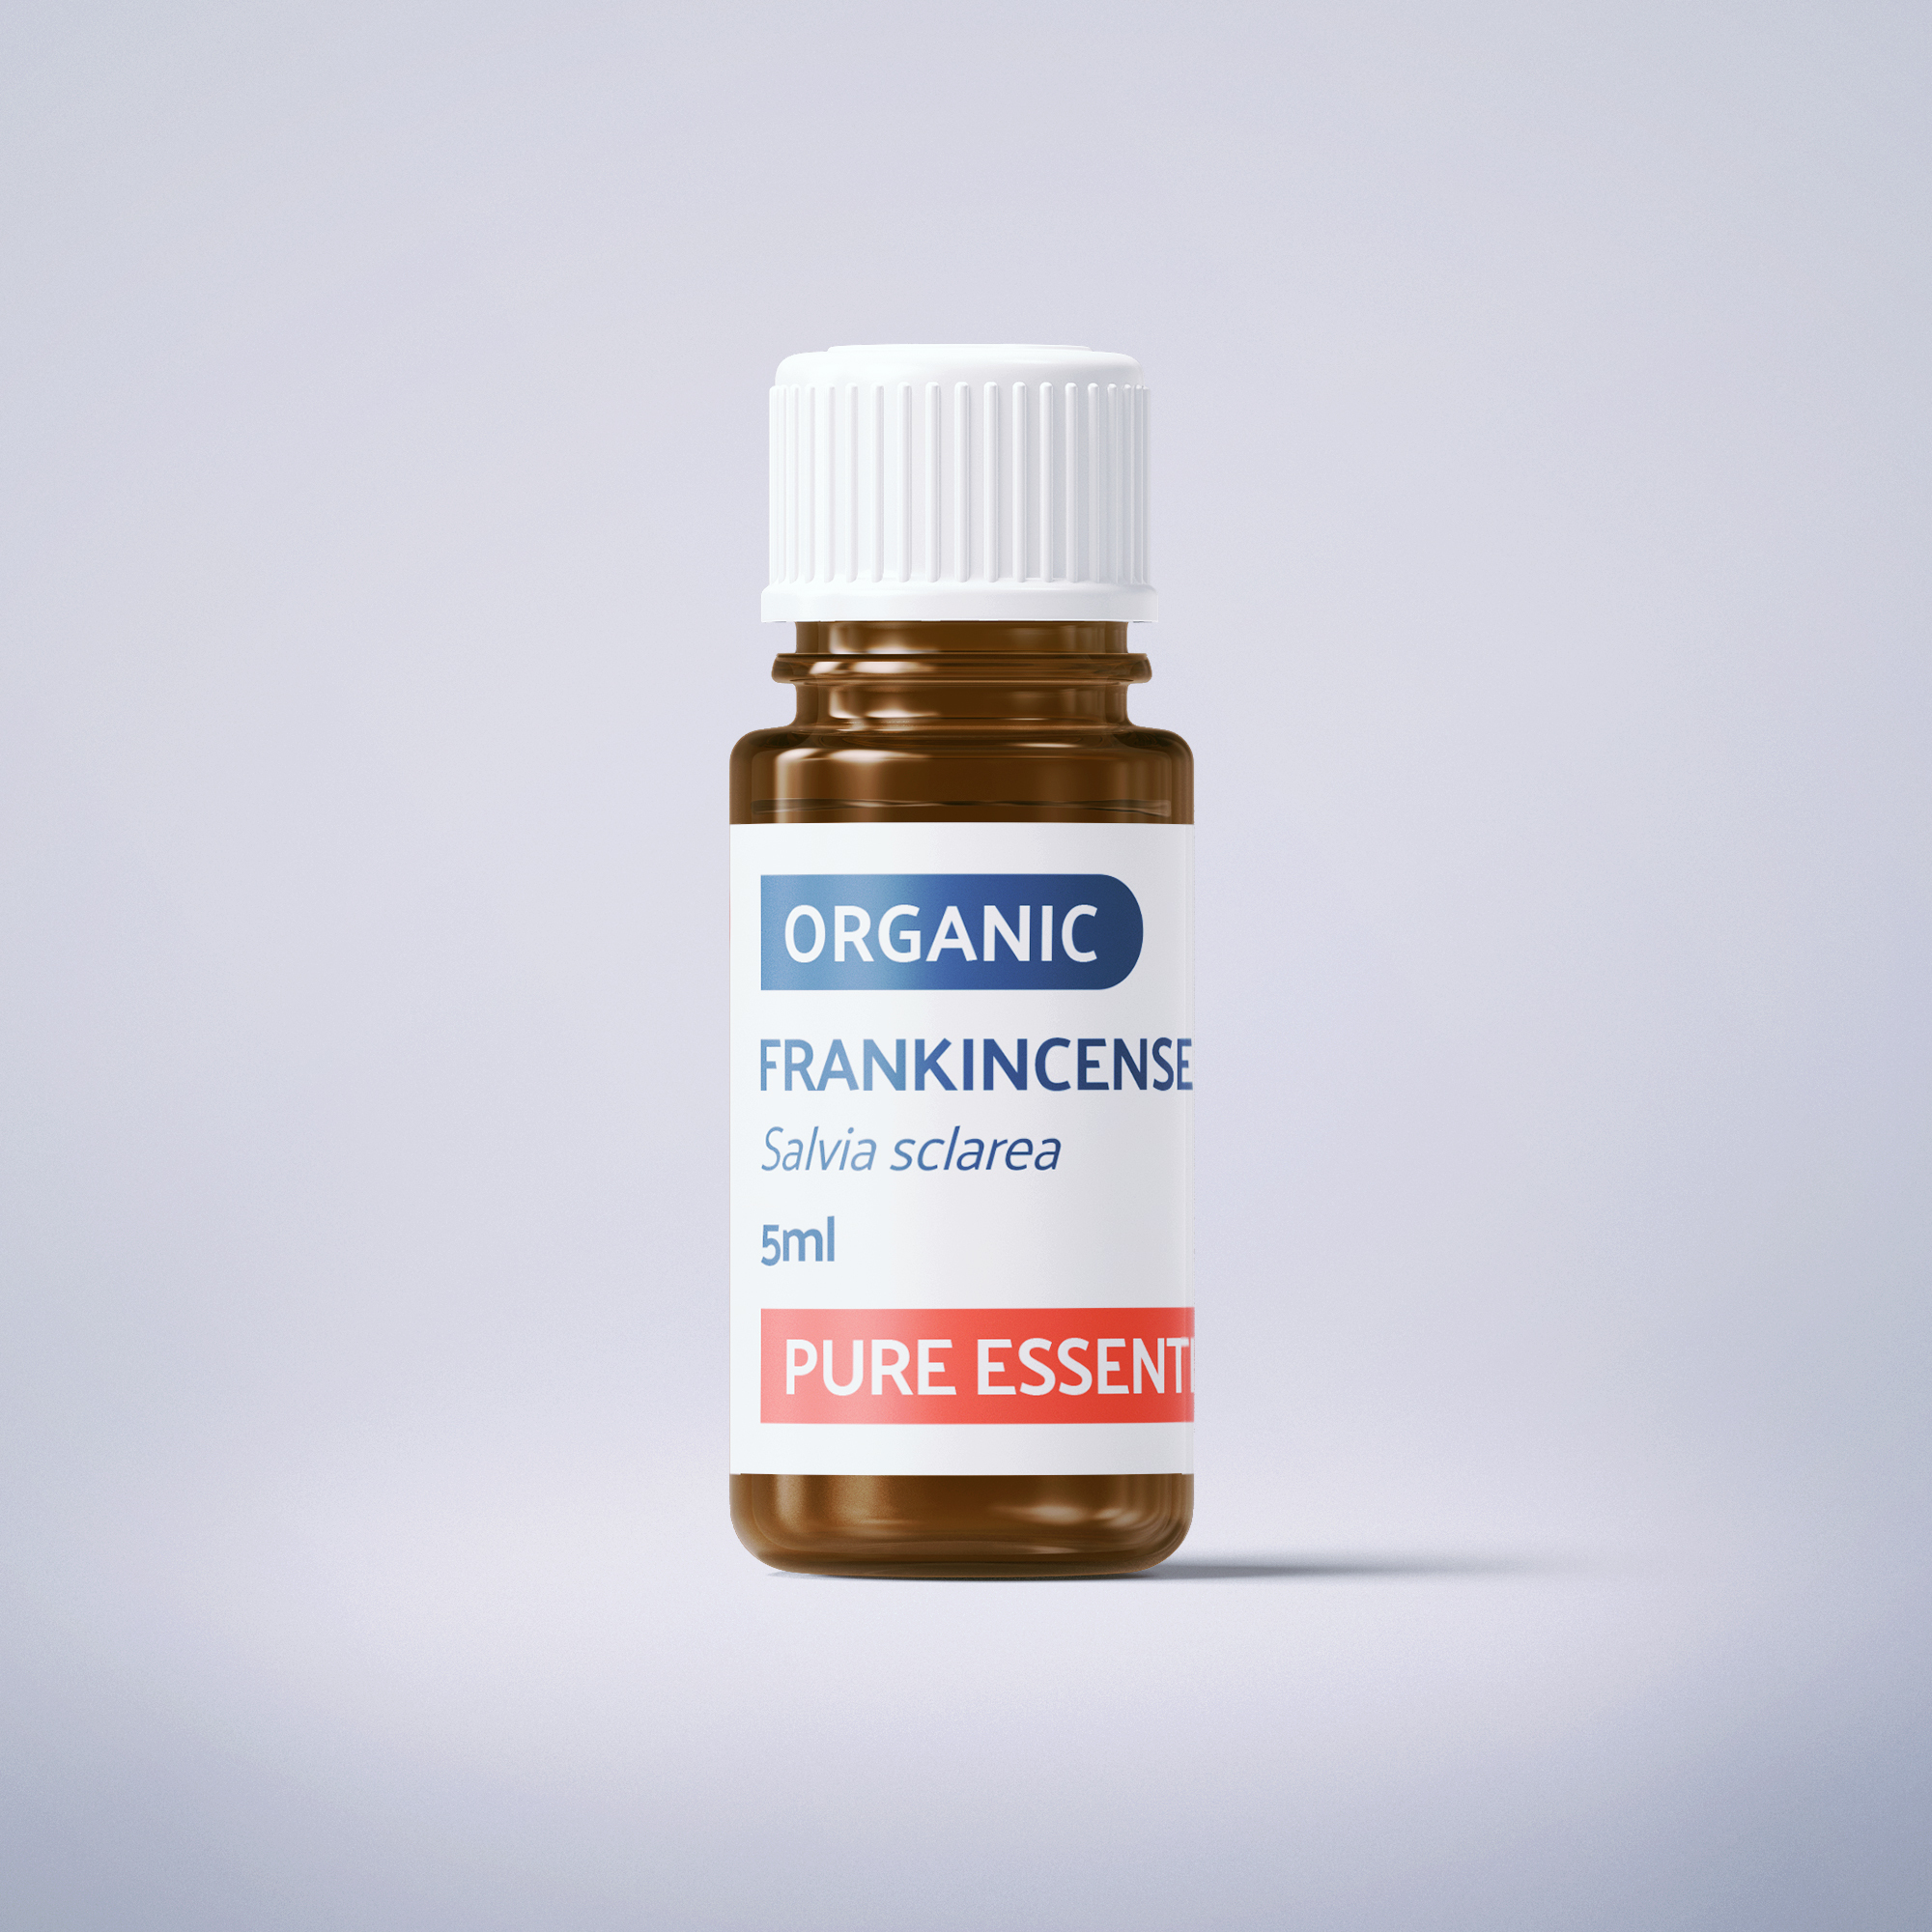 Organic Frankincense - 5ml - 100% Pure Essential Oil SKU002